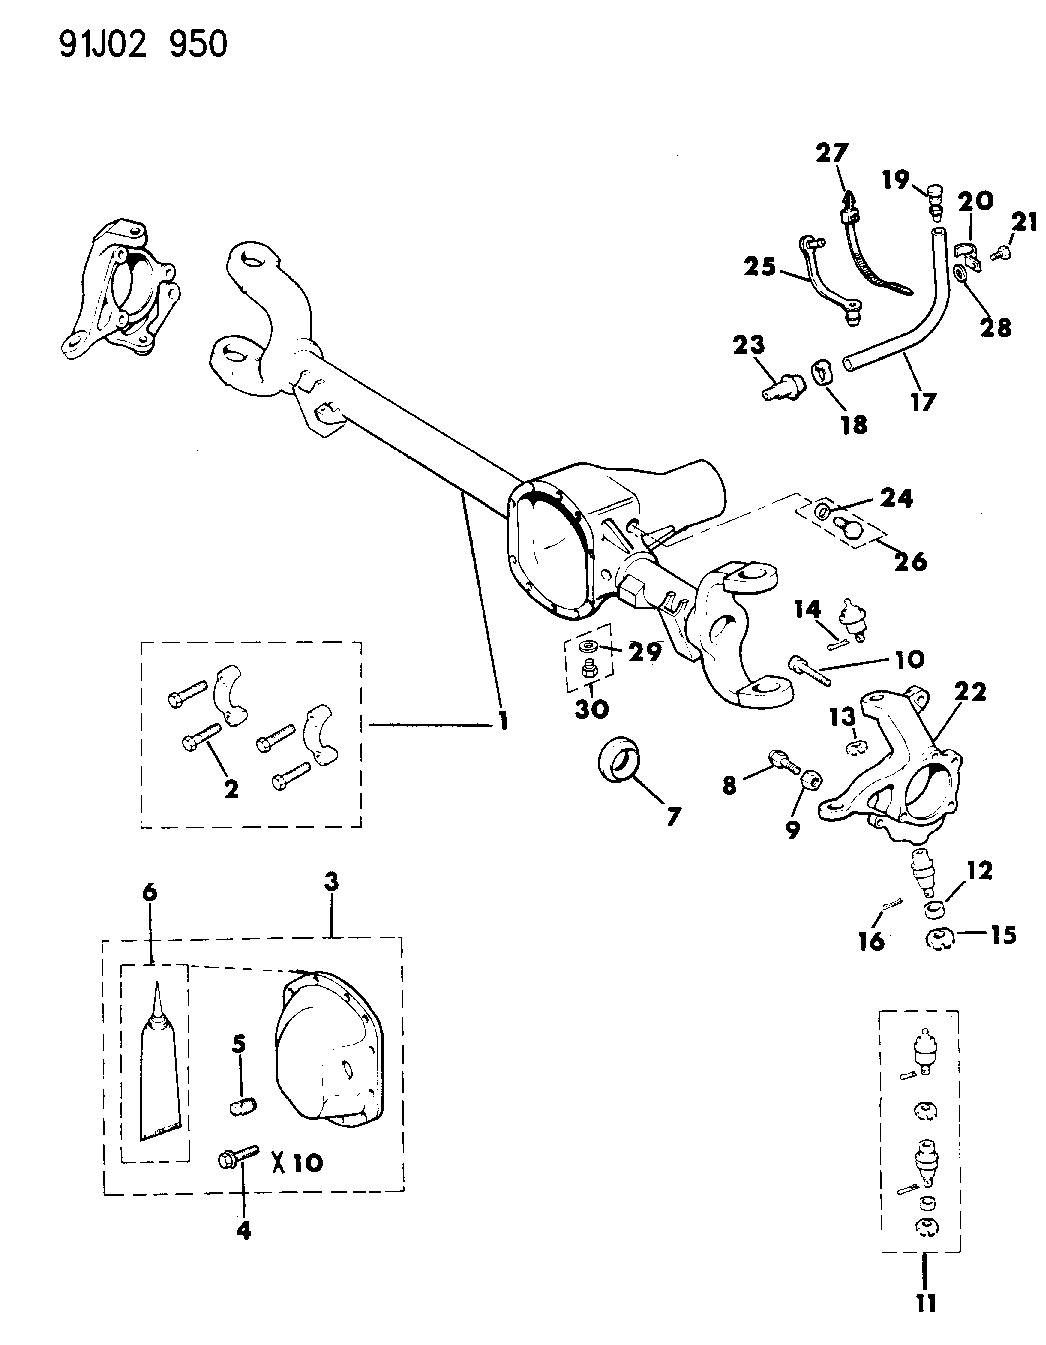 Jeep Wrangler Front Suspension Diagram